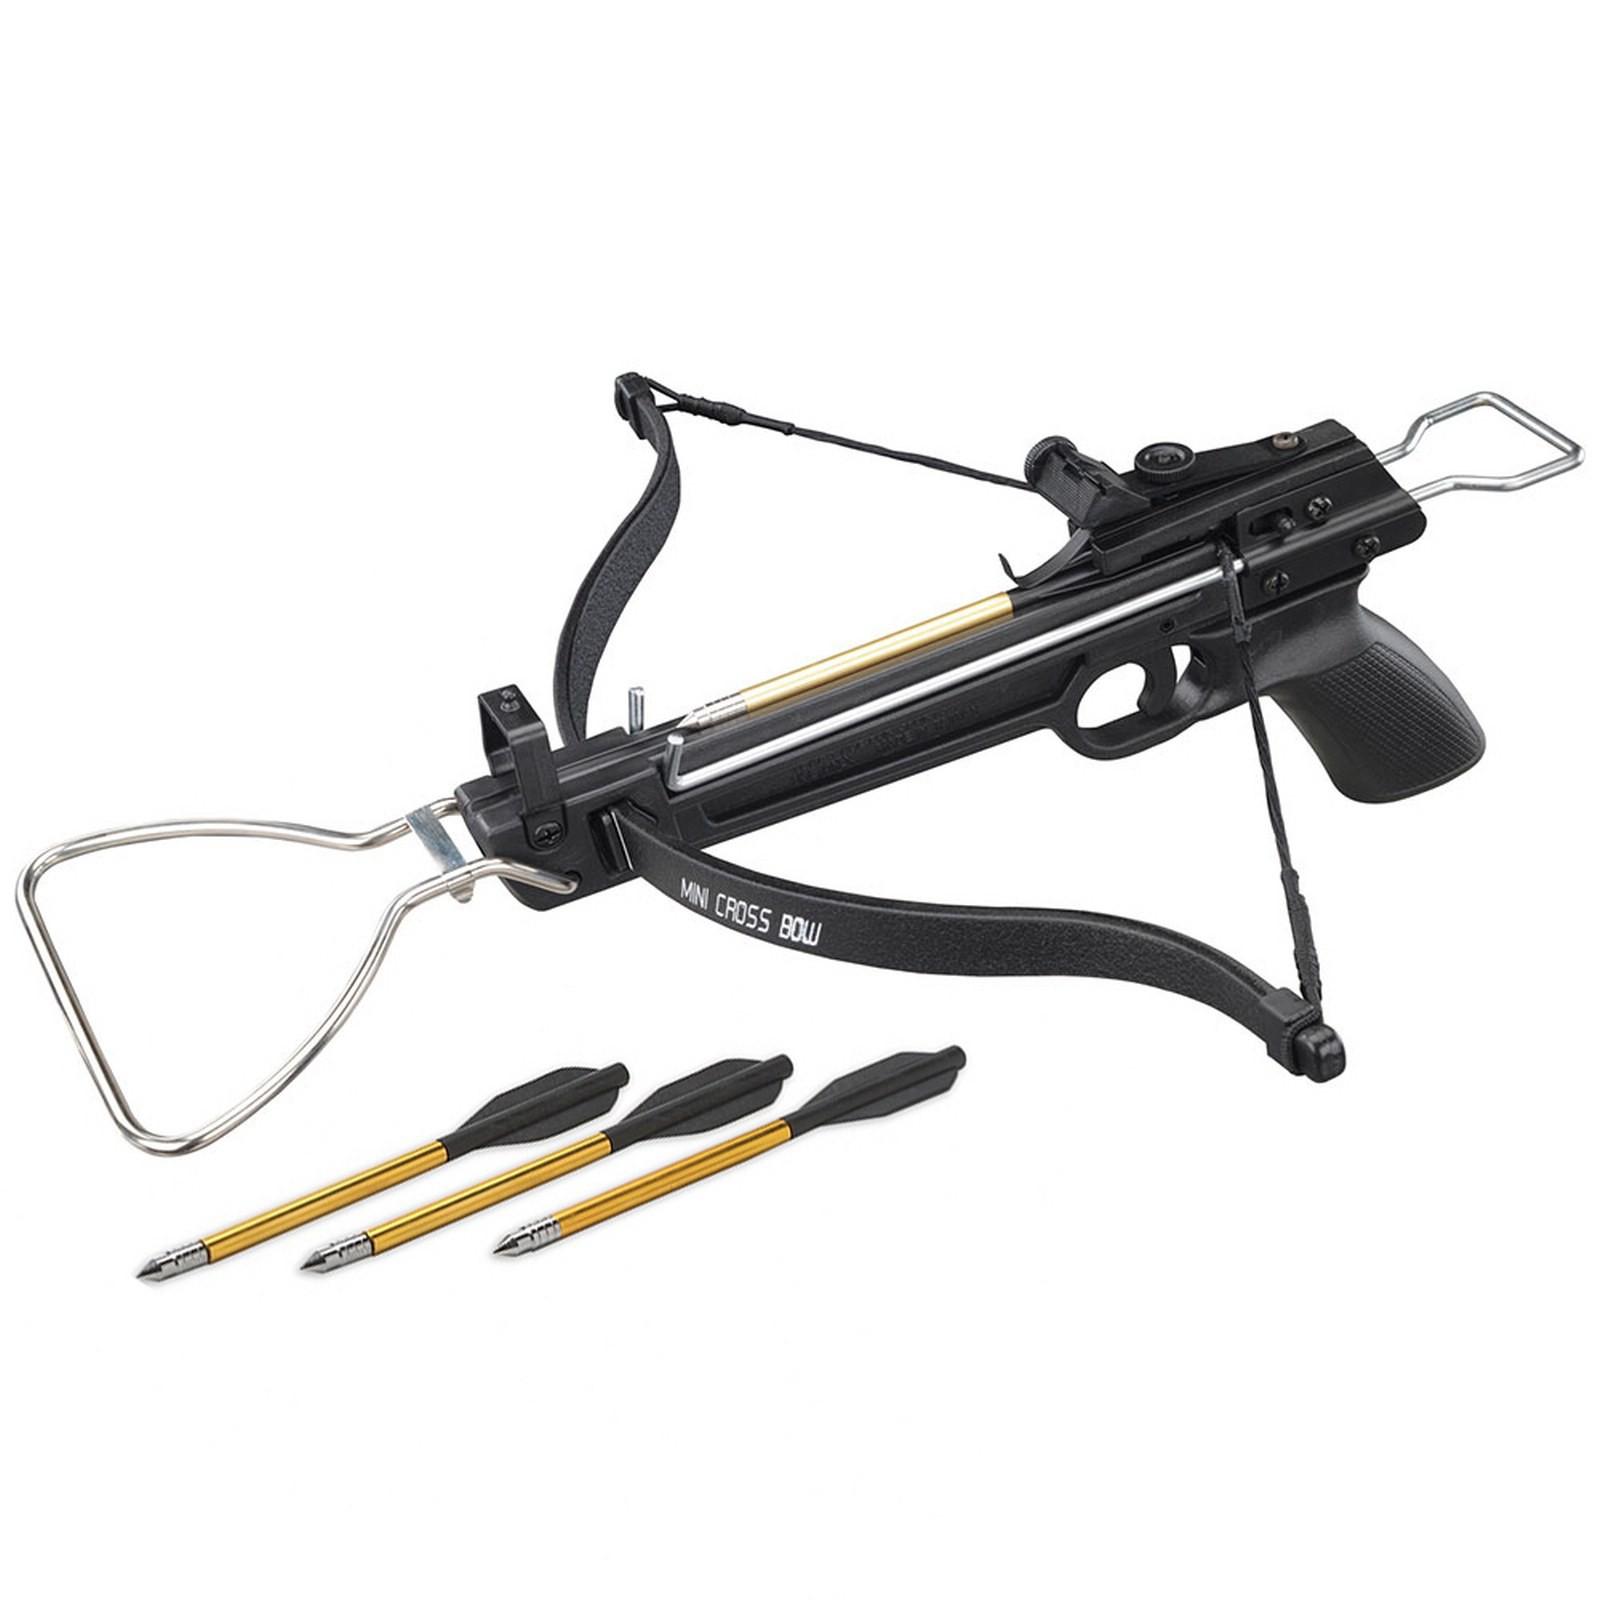 Pistola Balestra Professionale Royal MK 80A1